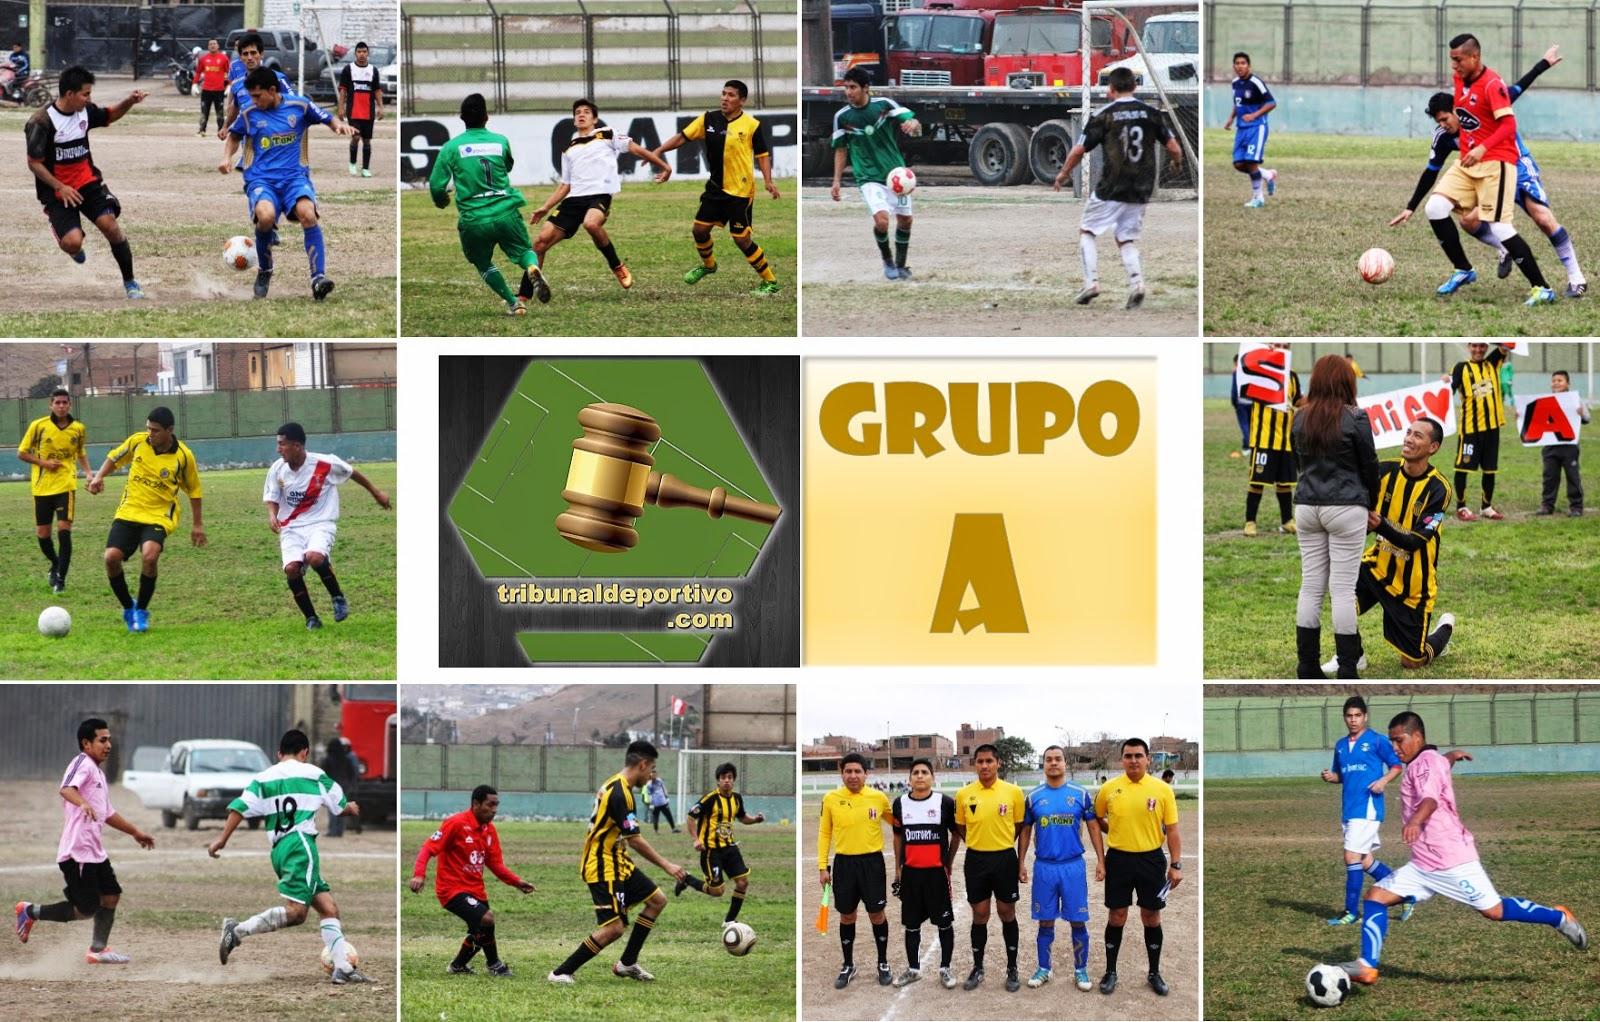 http://tribunal-deportivo.blogspot.com/2014/09/departamental-callao-1-fase-grupo-a.html